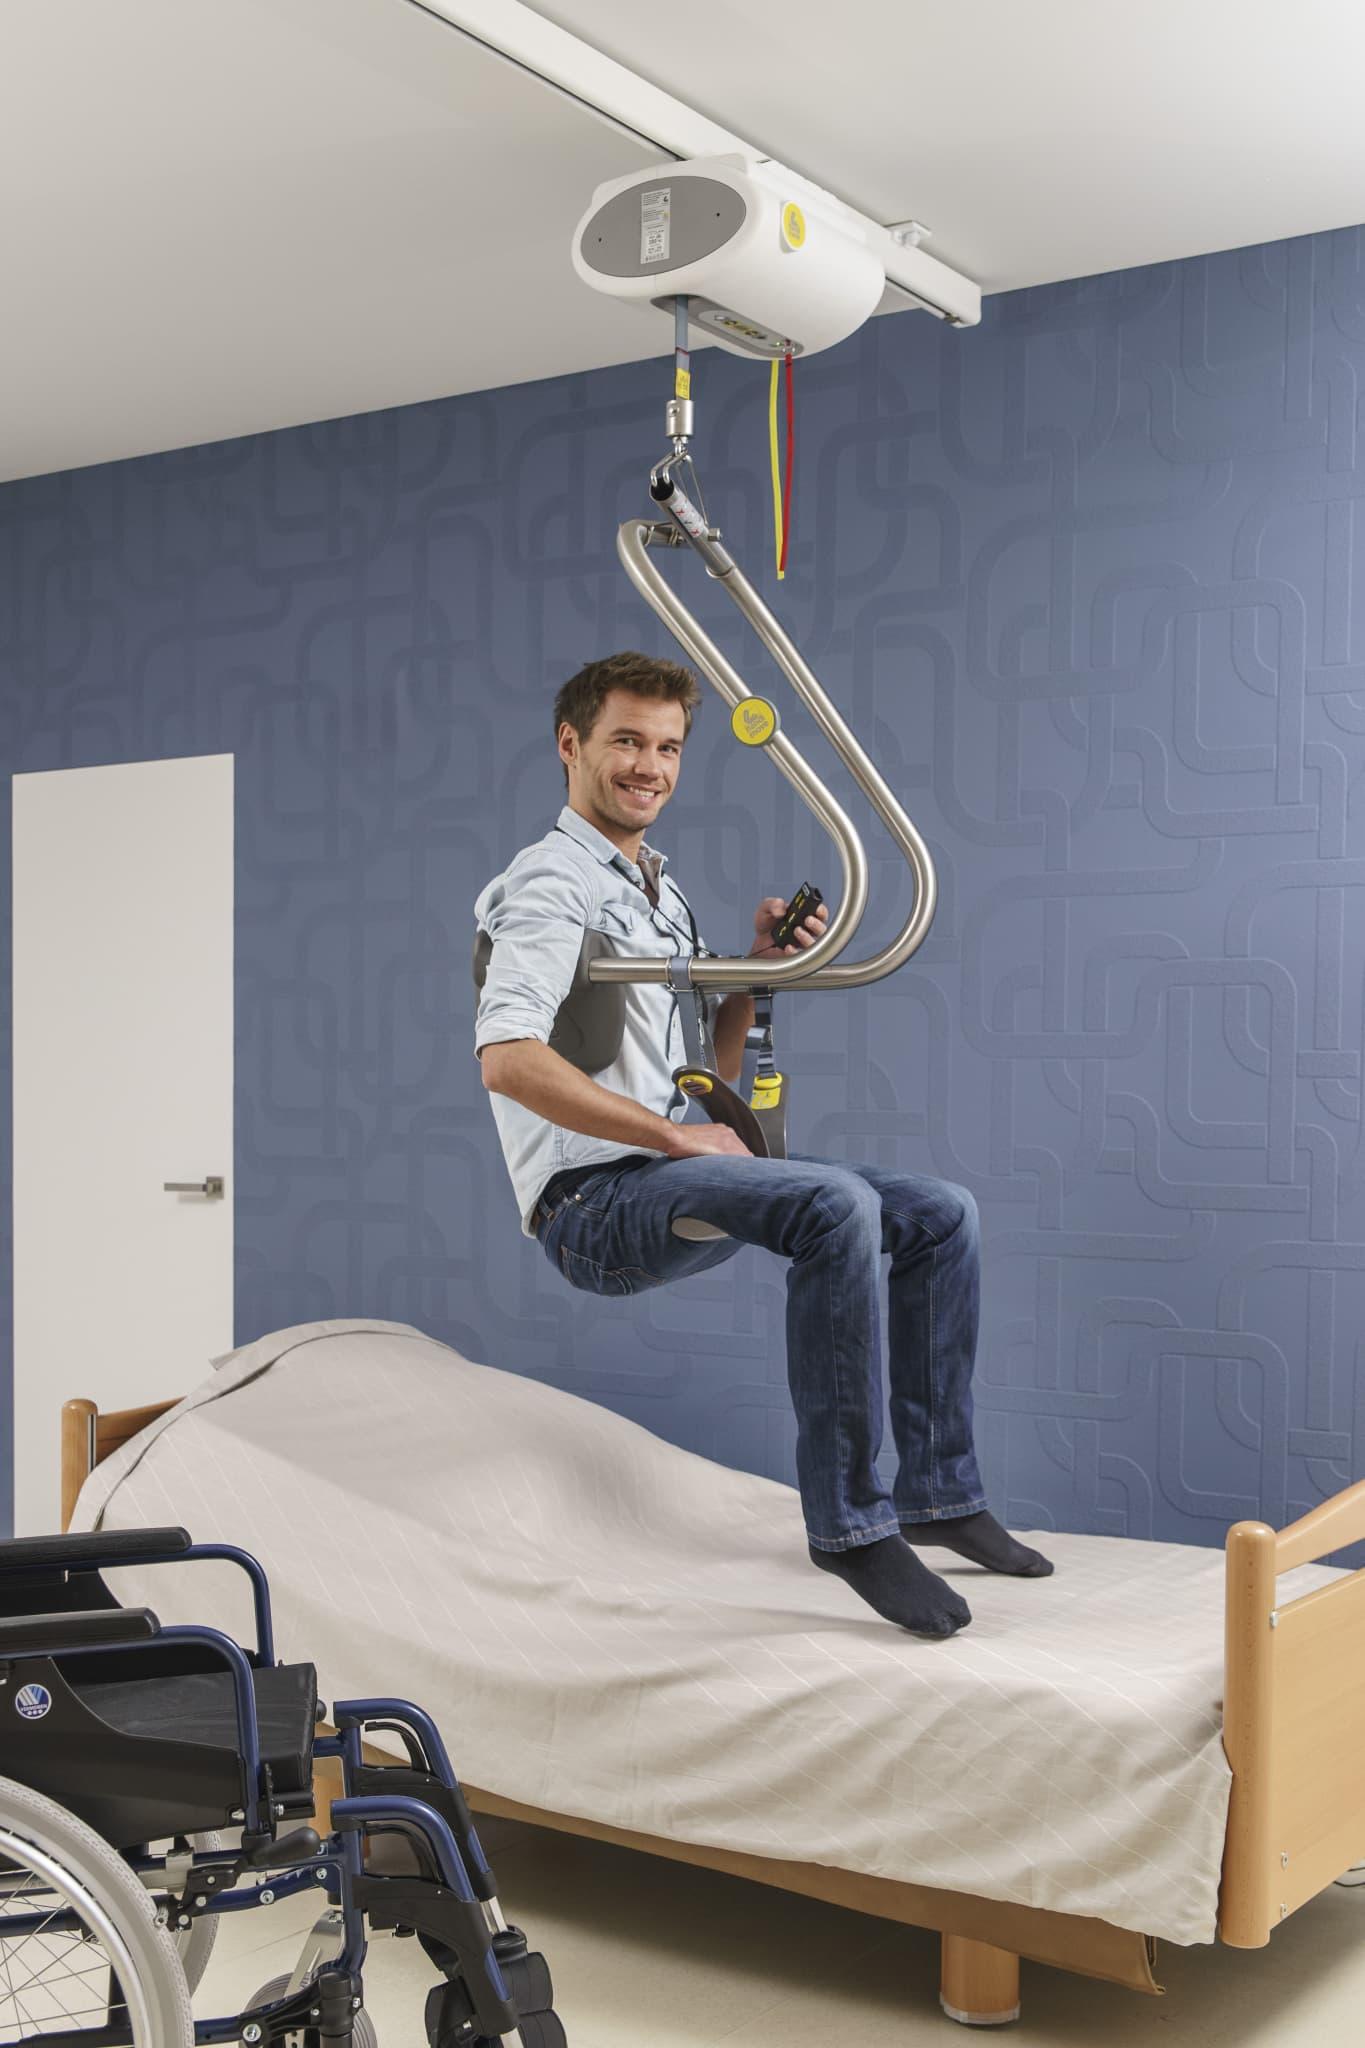 Handi-Move Ceiling Hoist